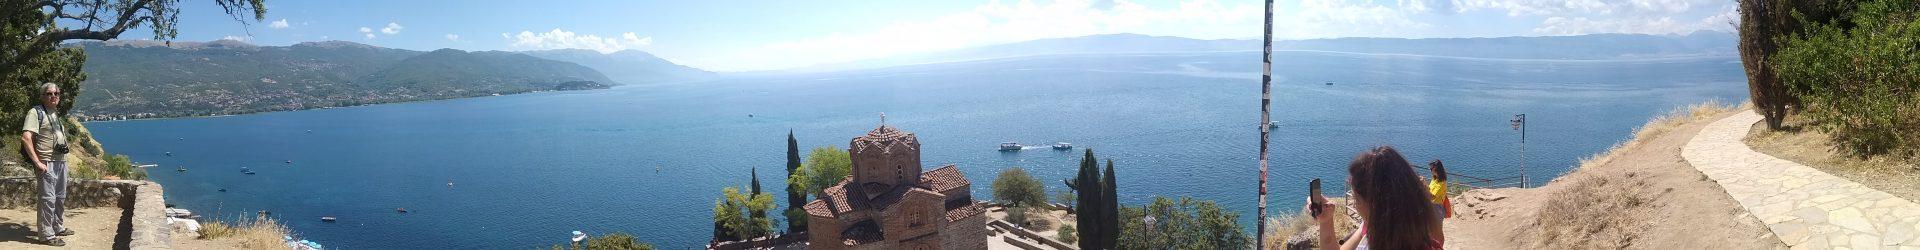 Trip to North Macedonia